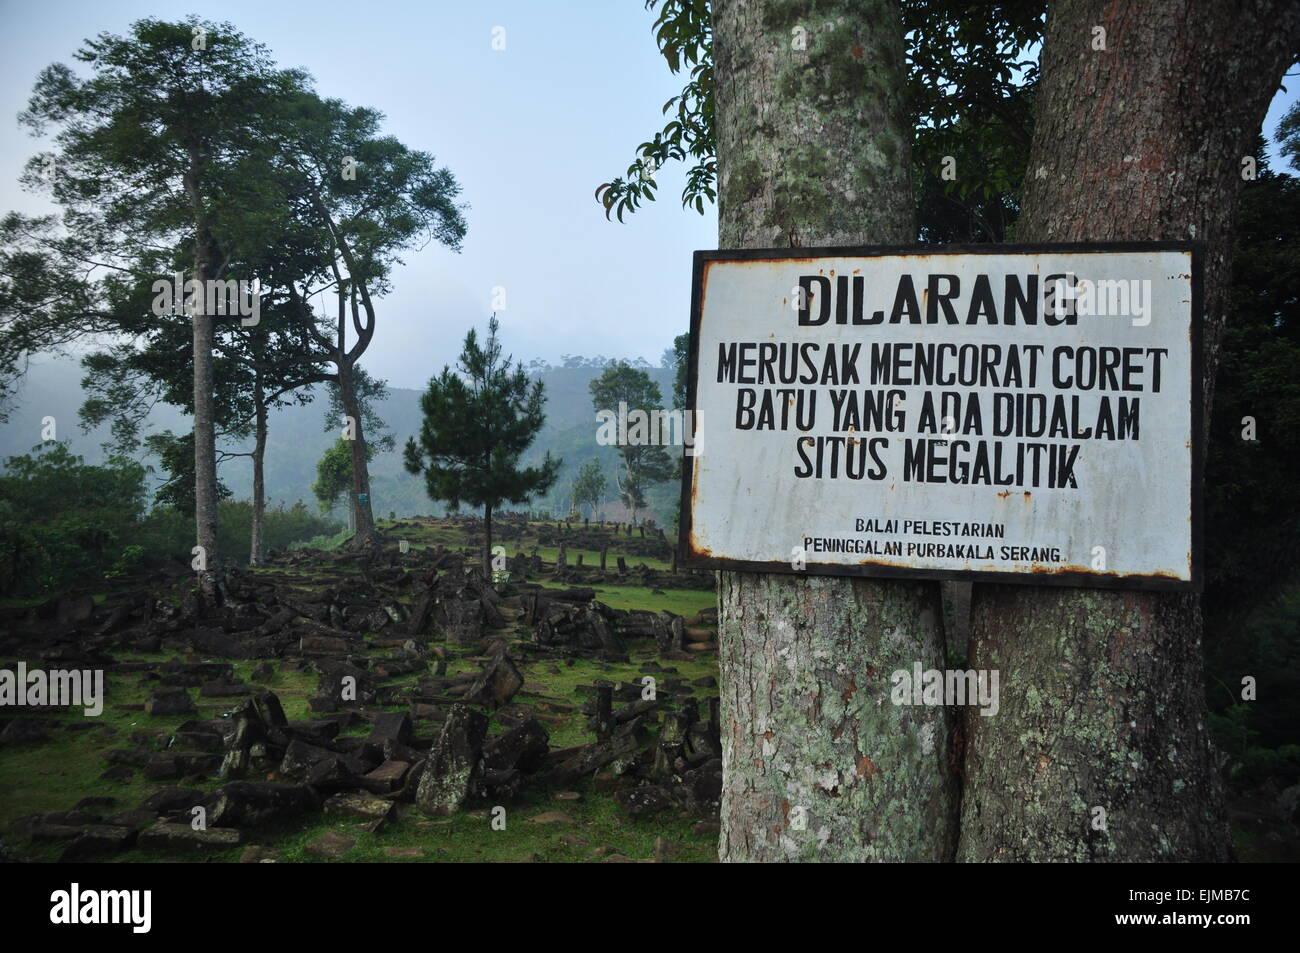 Situs datant en ligne Indonésie